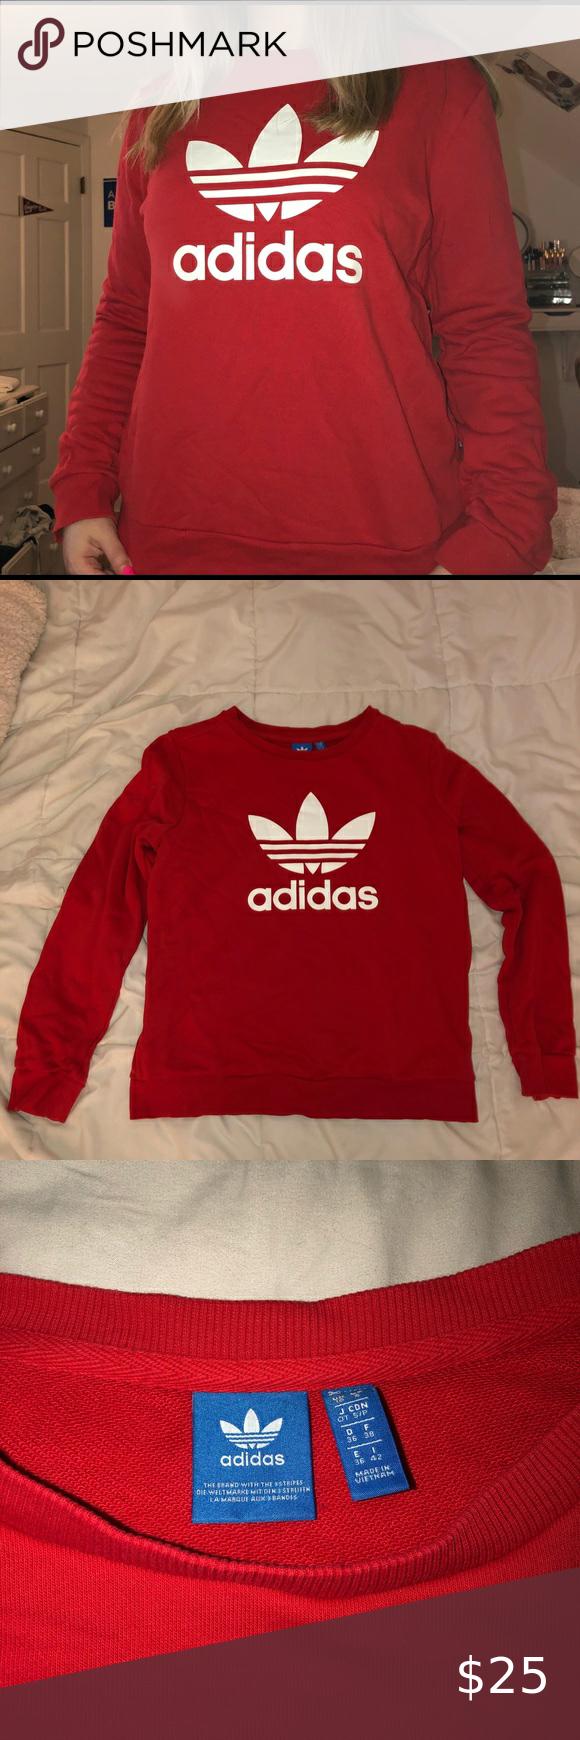 Red Adidas Crewneck In 2020 Red Adidas Adidas Tops Sweatshirt Tops [ 1740 x 580 Pixel ]